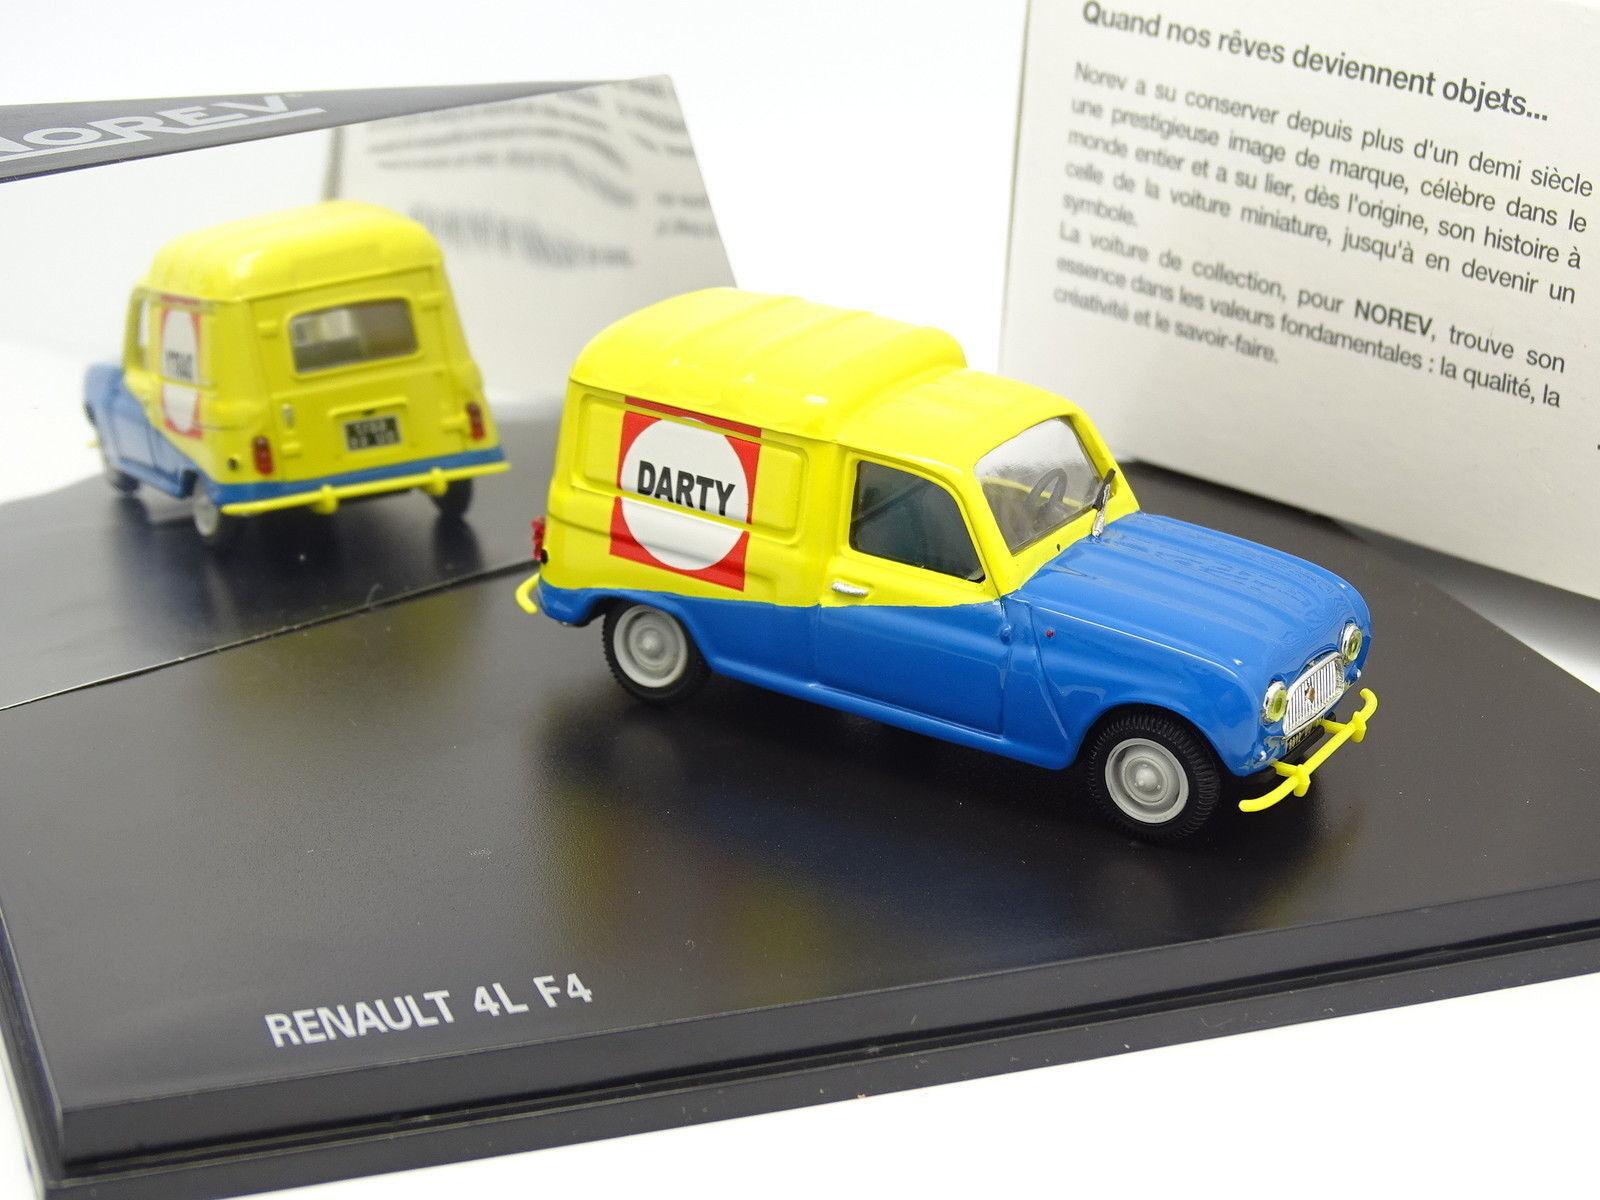 Norev 1 43 - Renault 4 4L F4 Darty